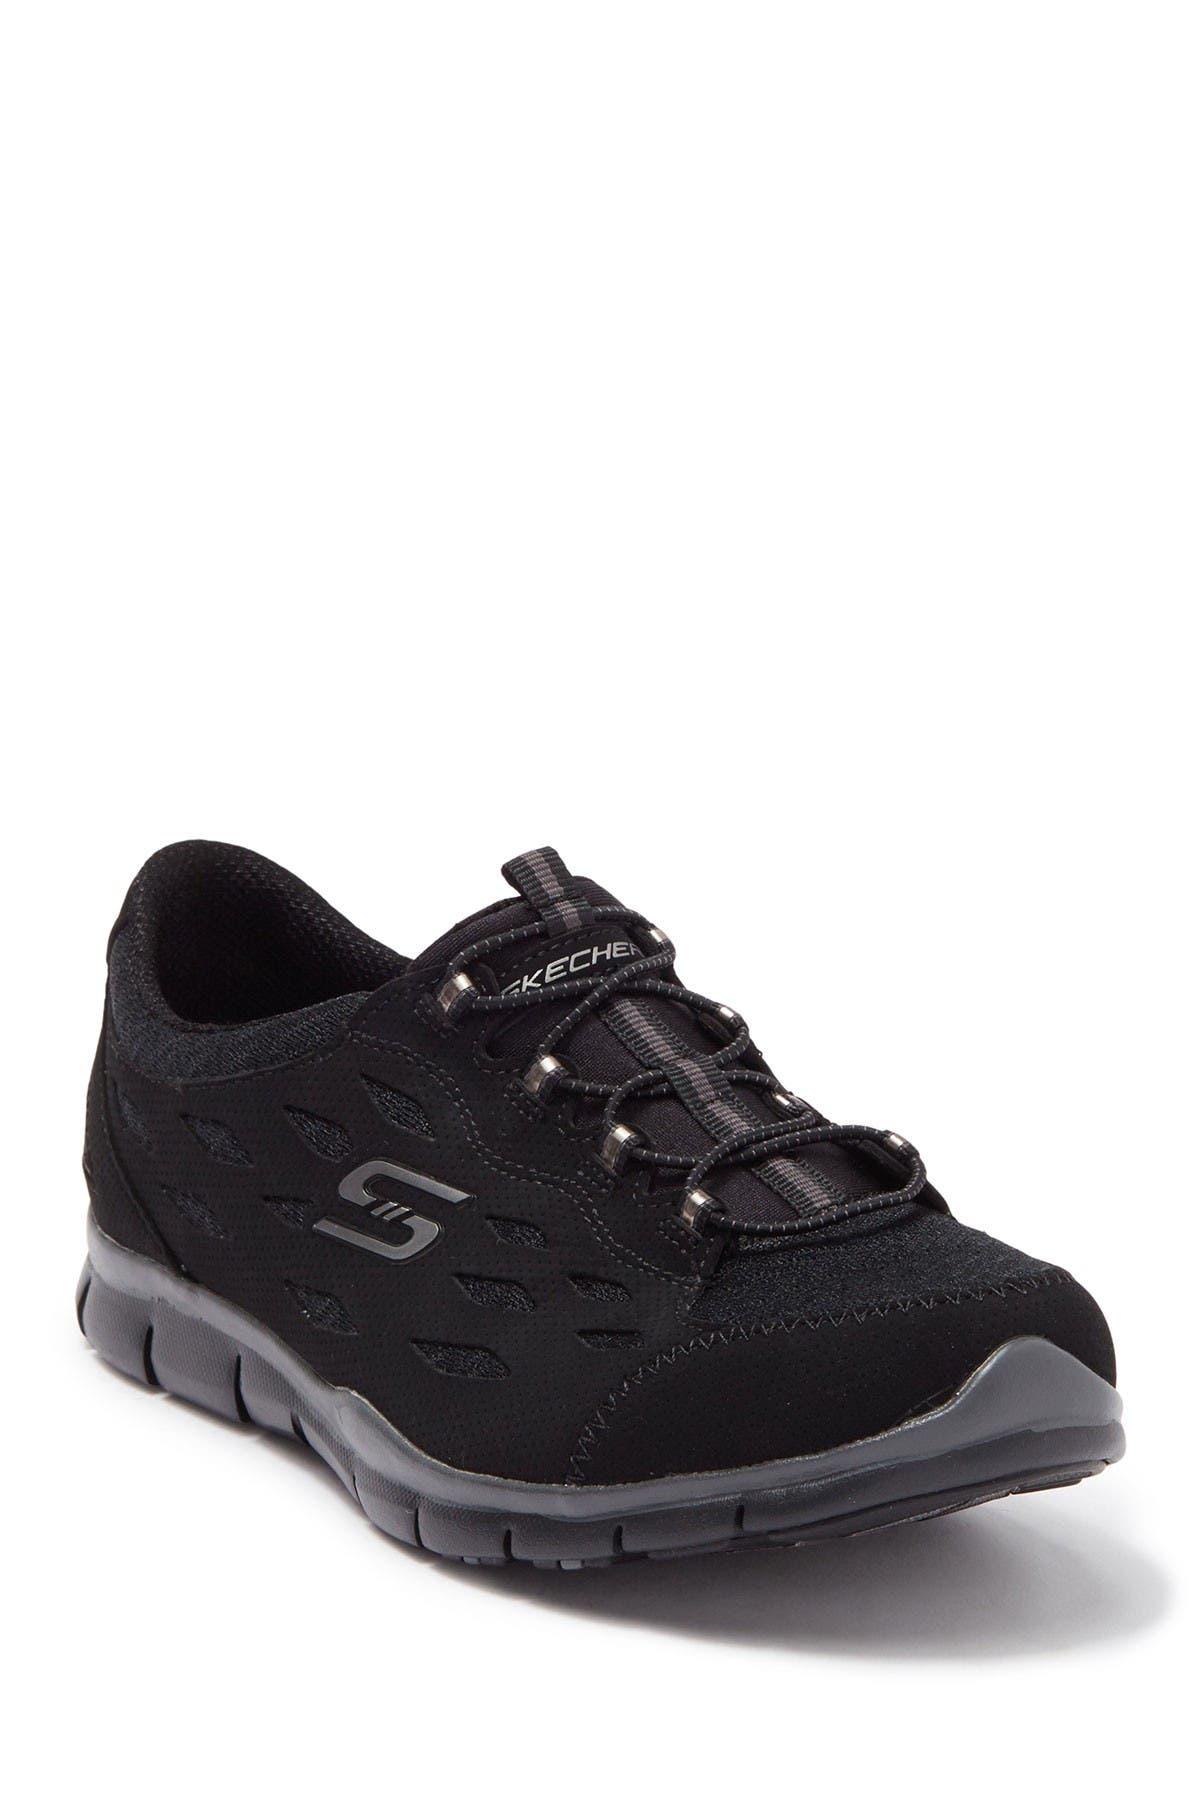 Image of Skechers Gratis Slip-On Sneaker